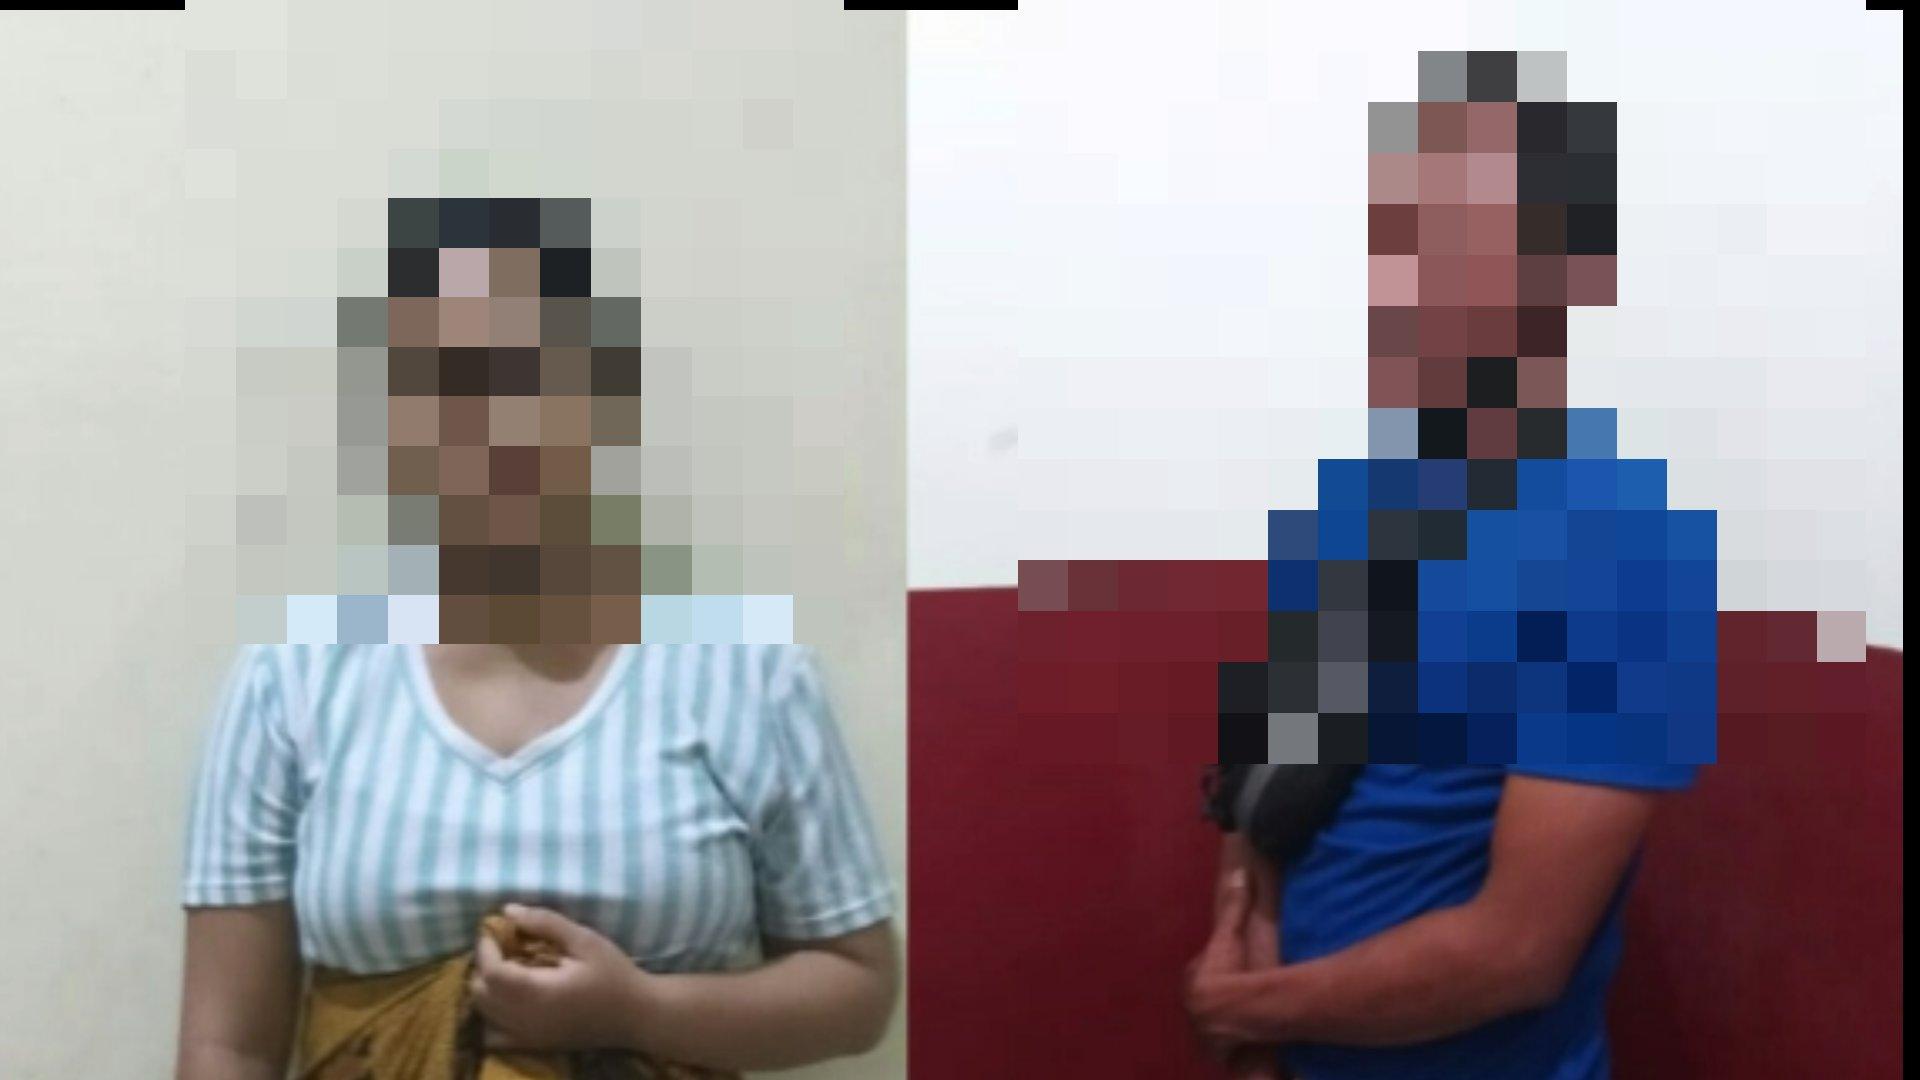 Penemuan Mayat Bayi Dalam Kardus, Polsek Sawan Amankan 2 Terduga Pelaku